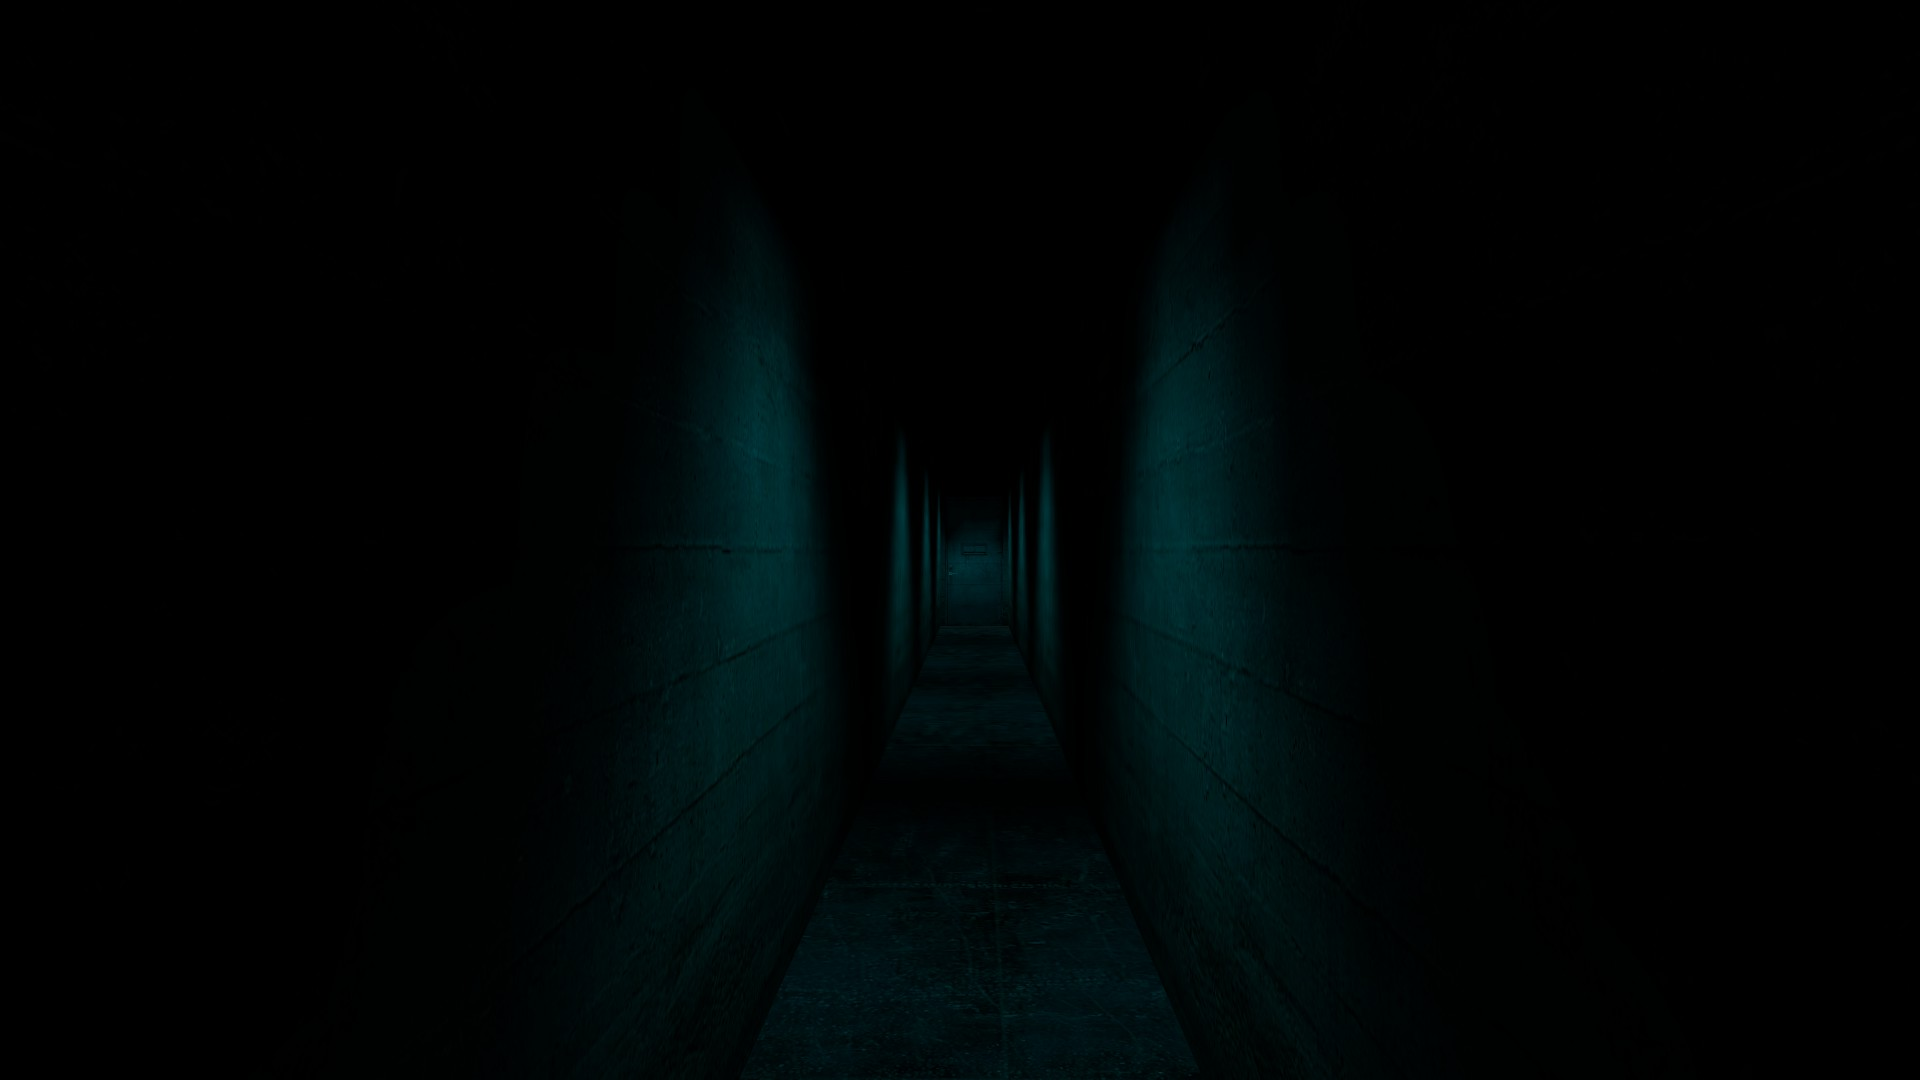 Mysterious Image Black Flames Mod For Half Life 2 Mod Db